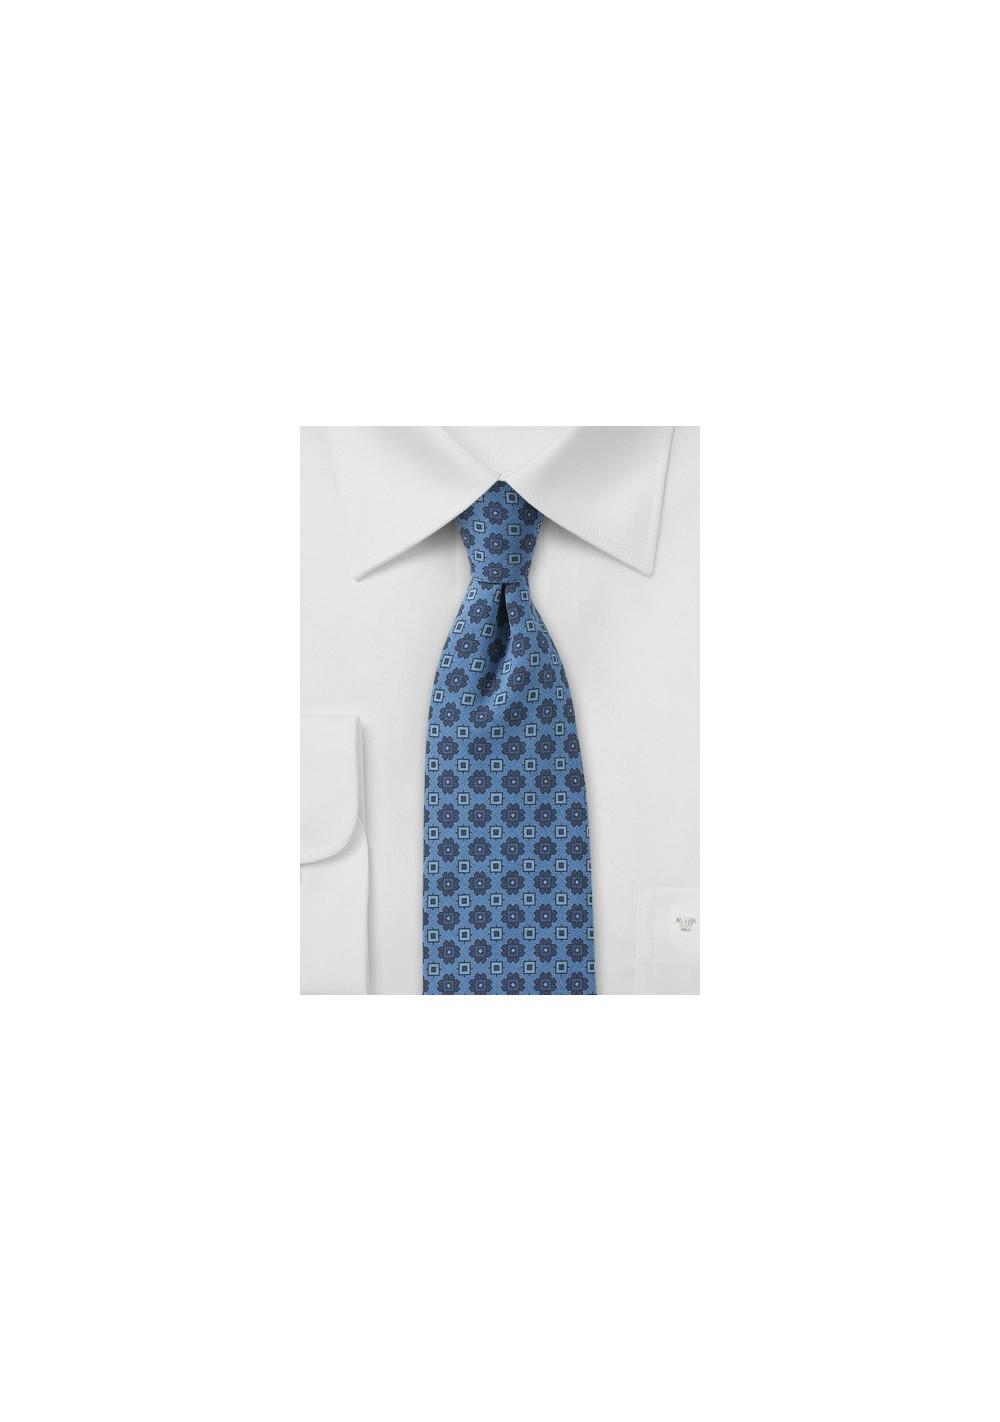 Geometric Skinny Tie in Blue Jean Color